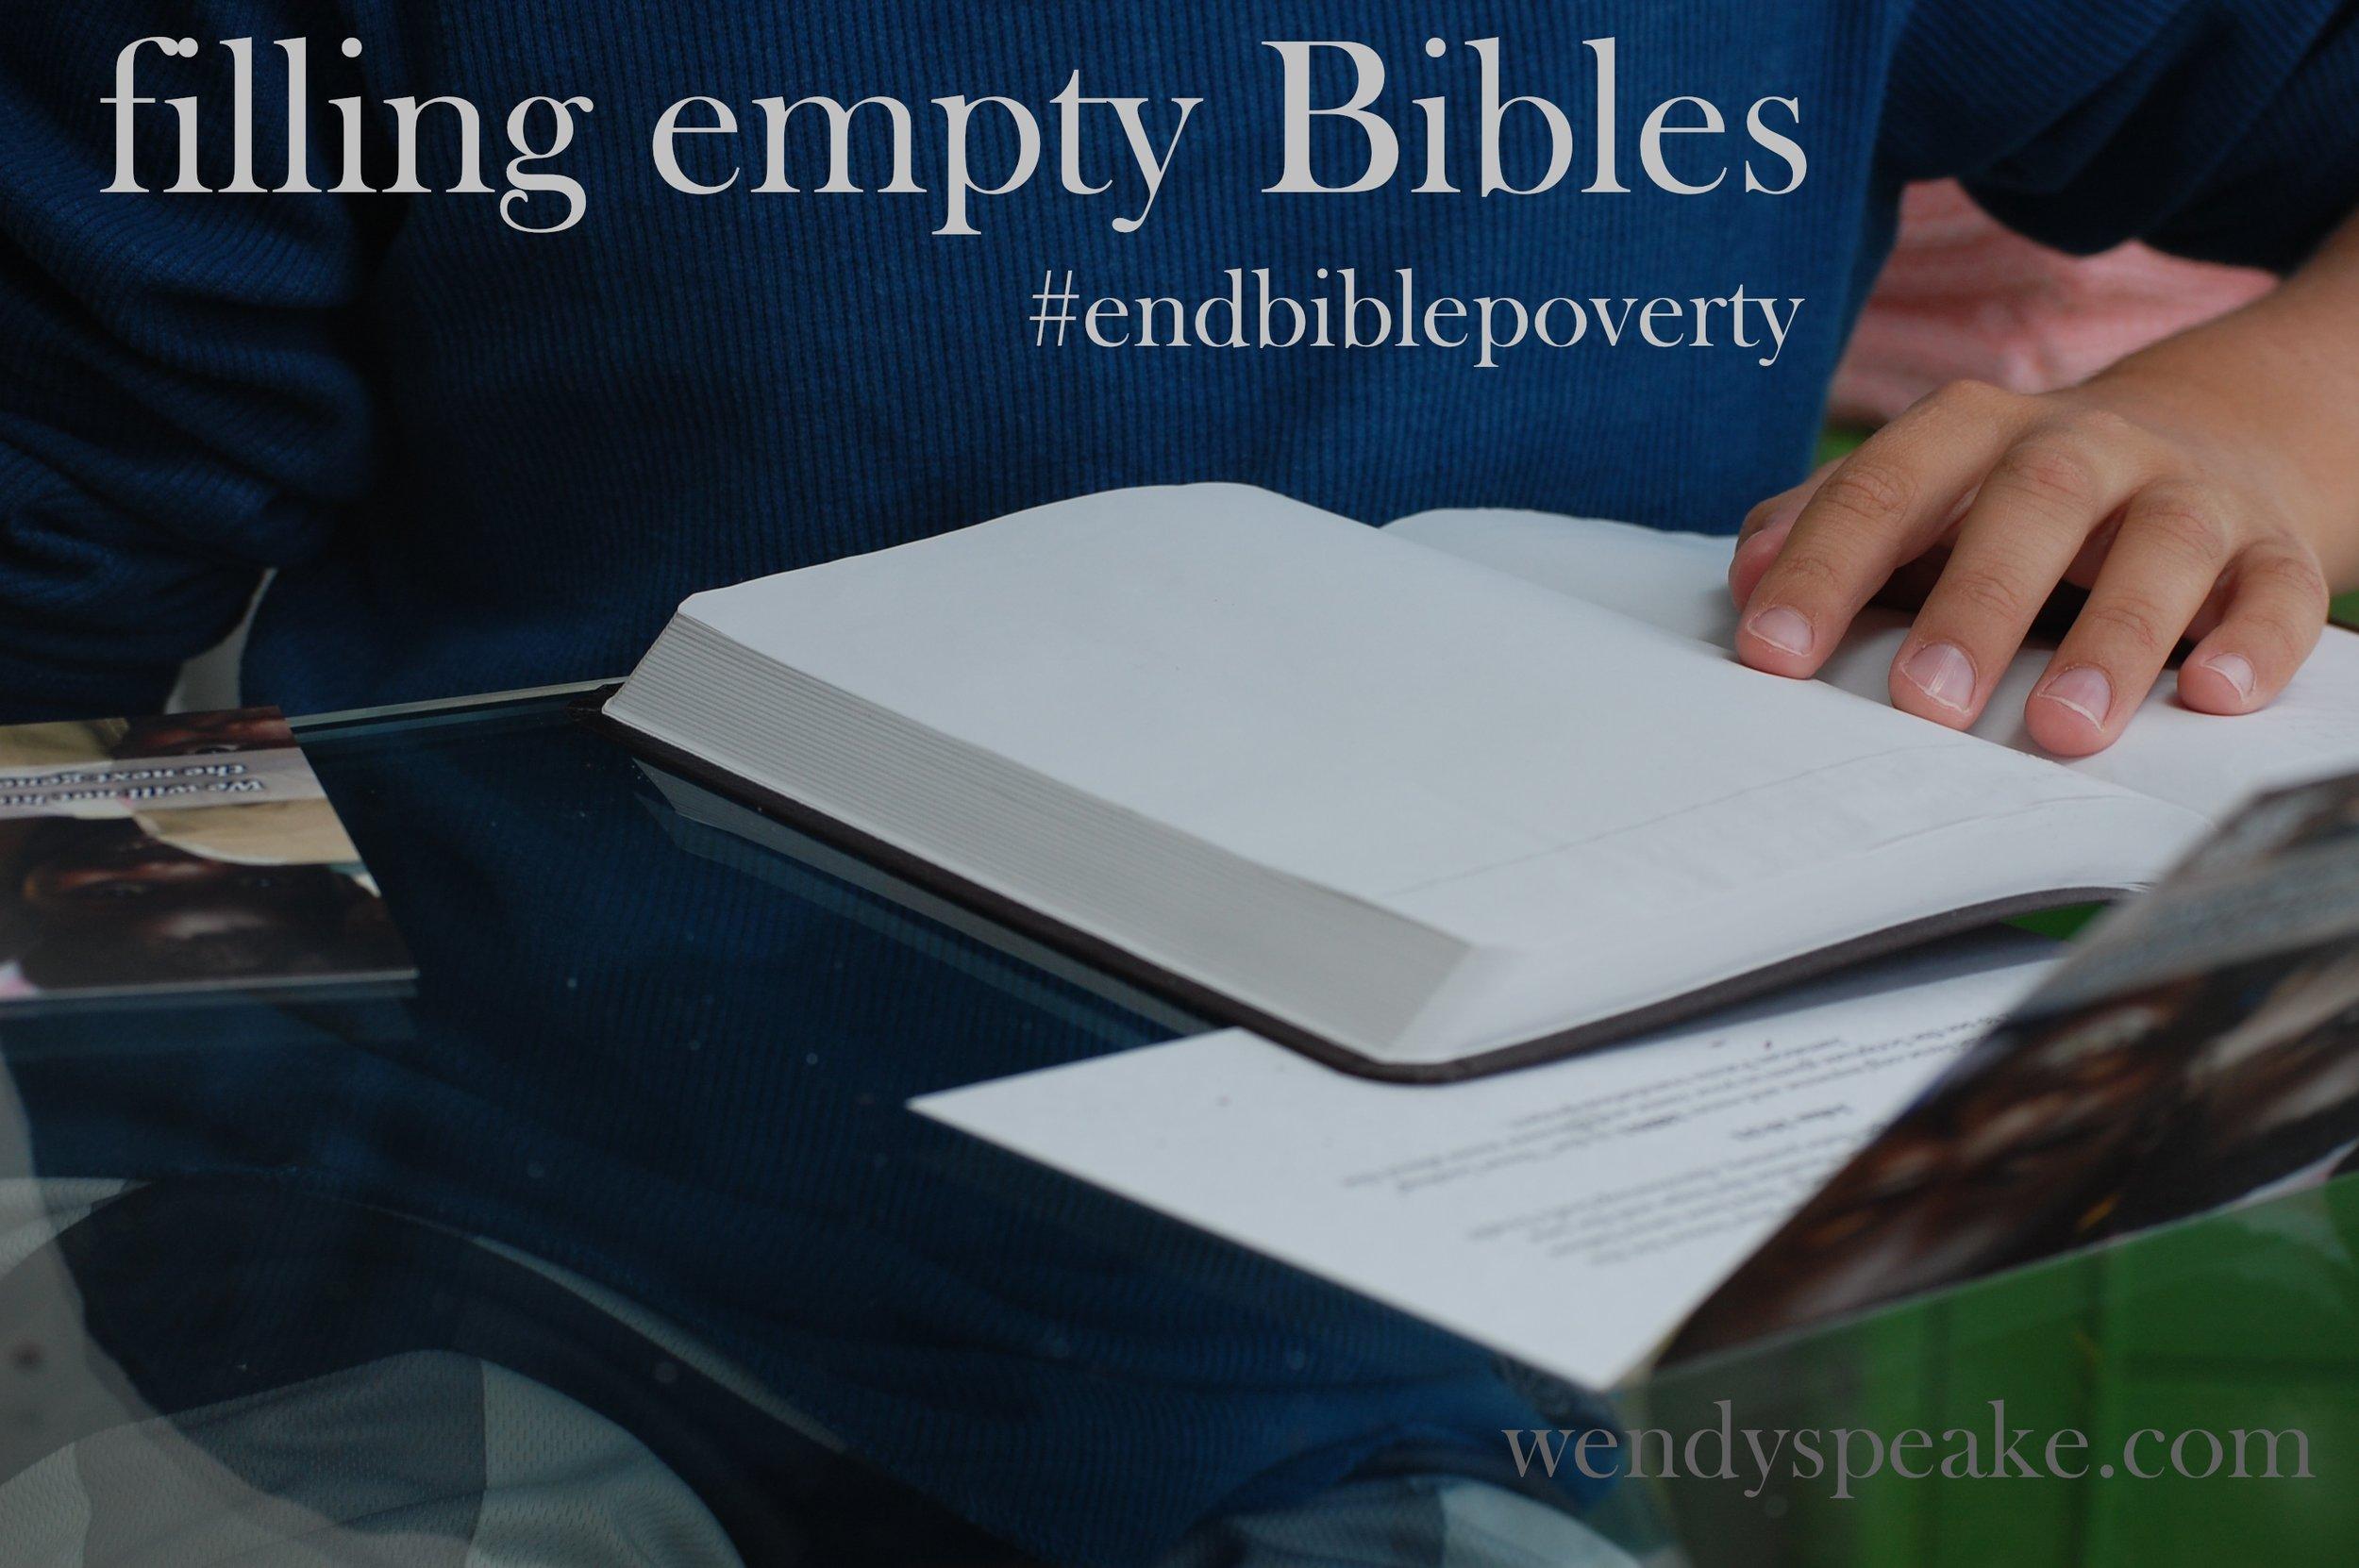 bibles pic